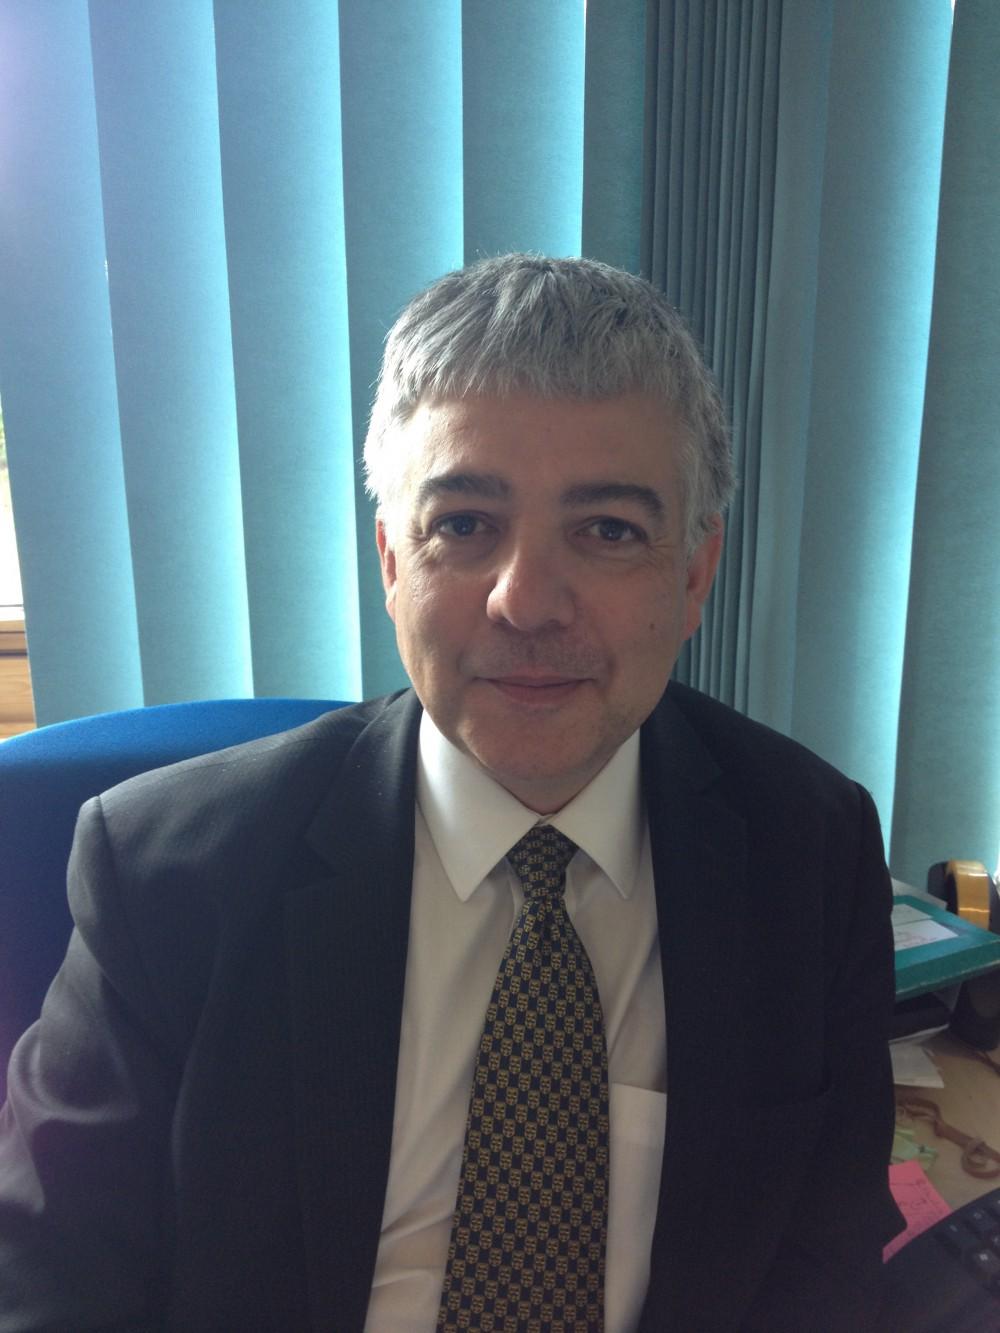 Professor John Alcolado